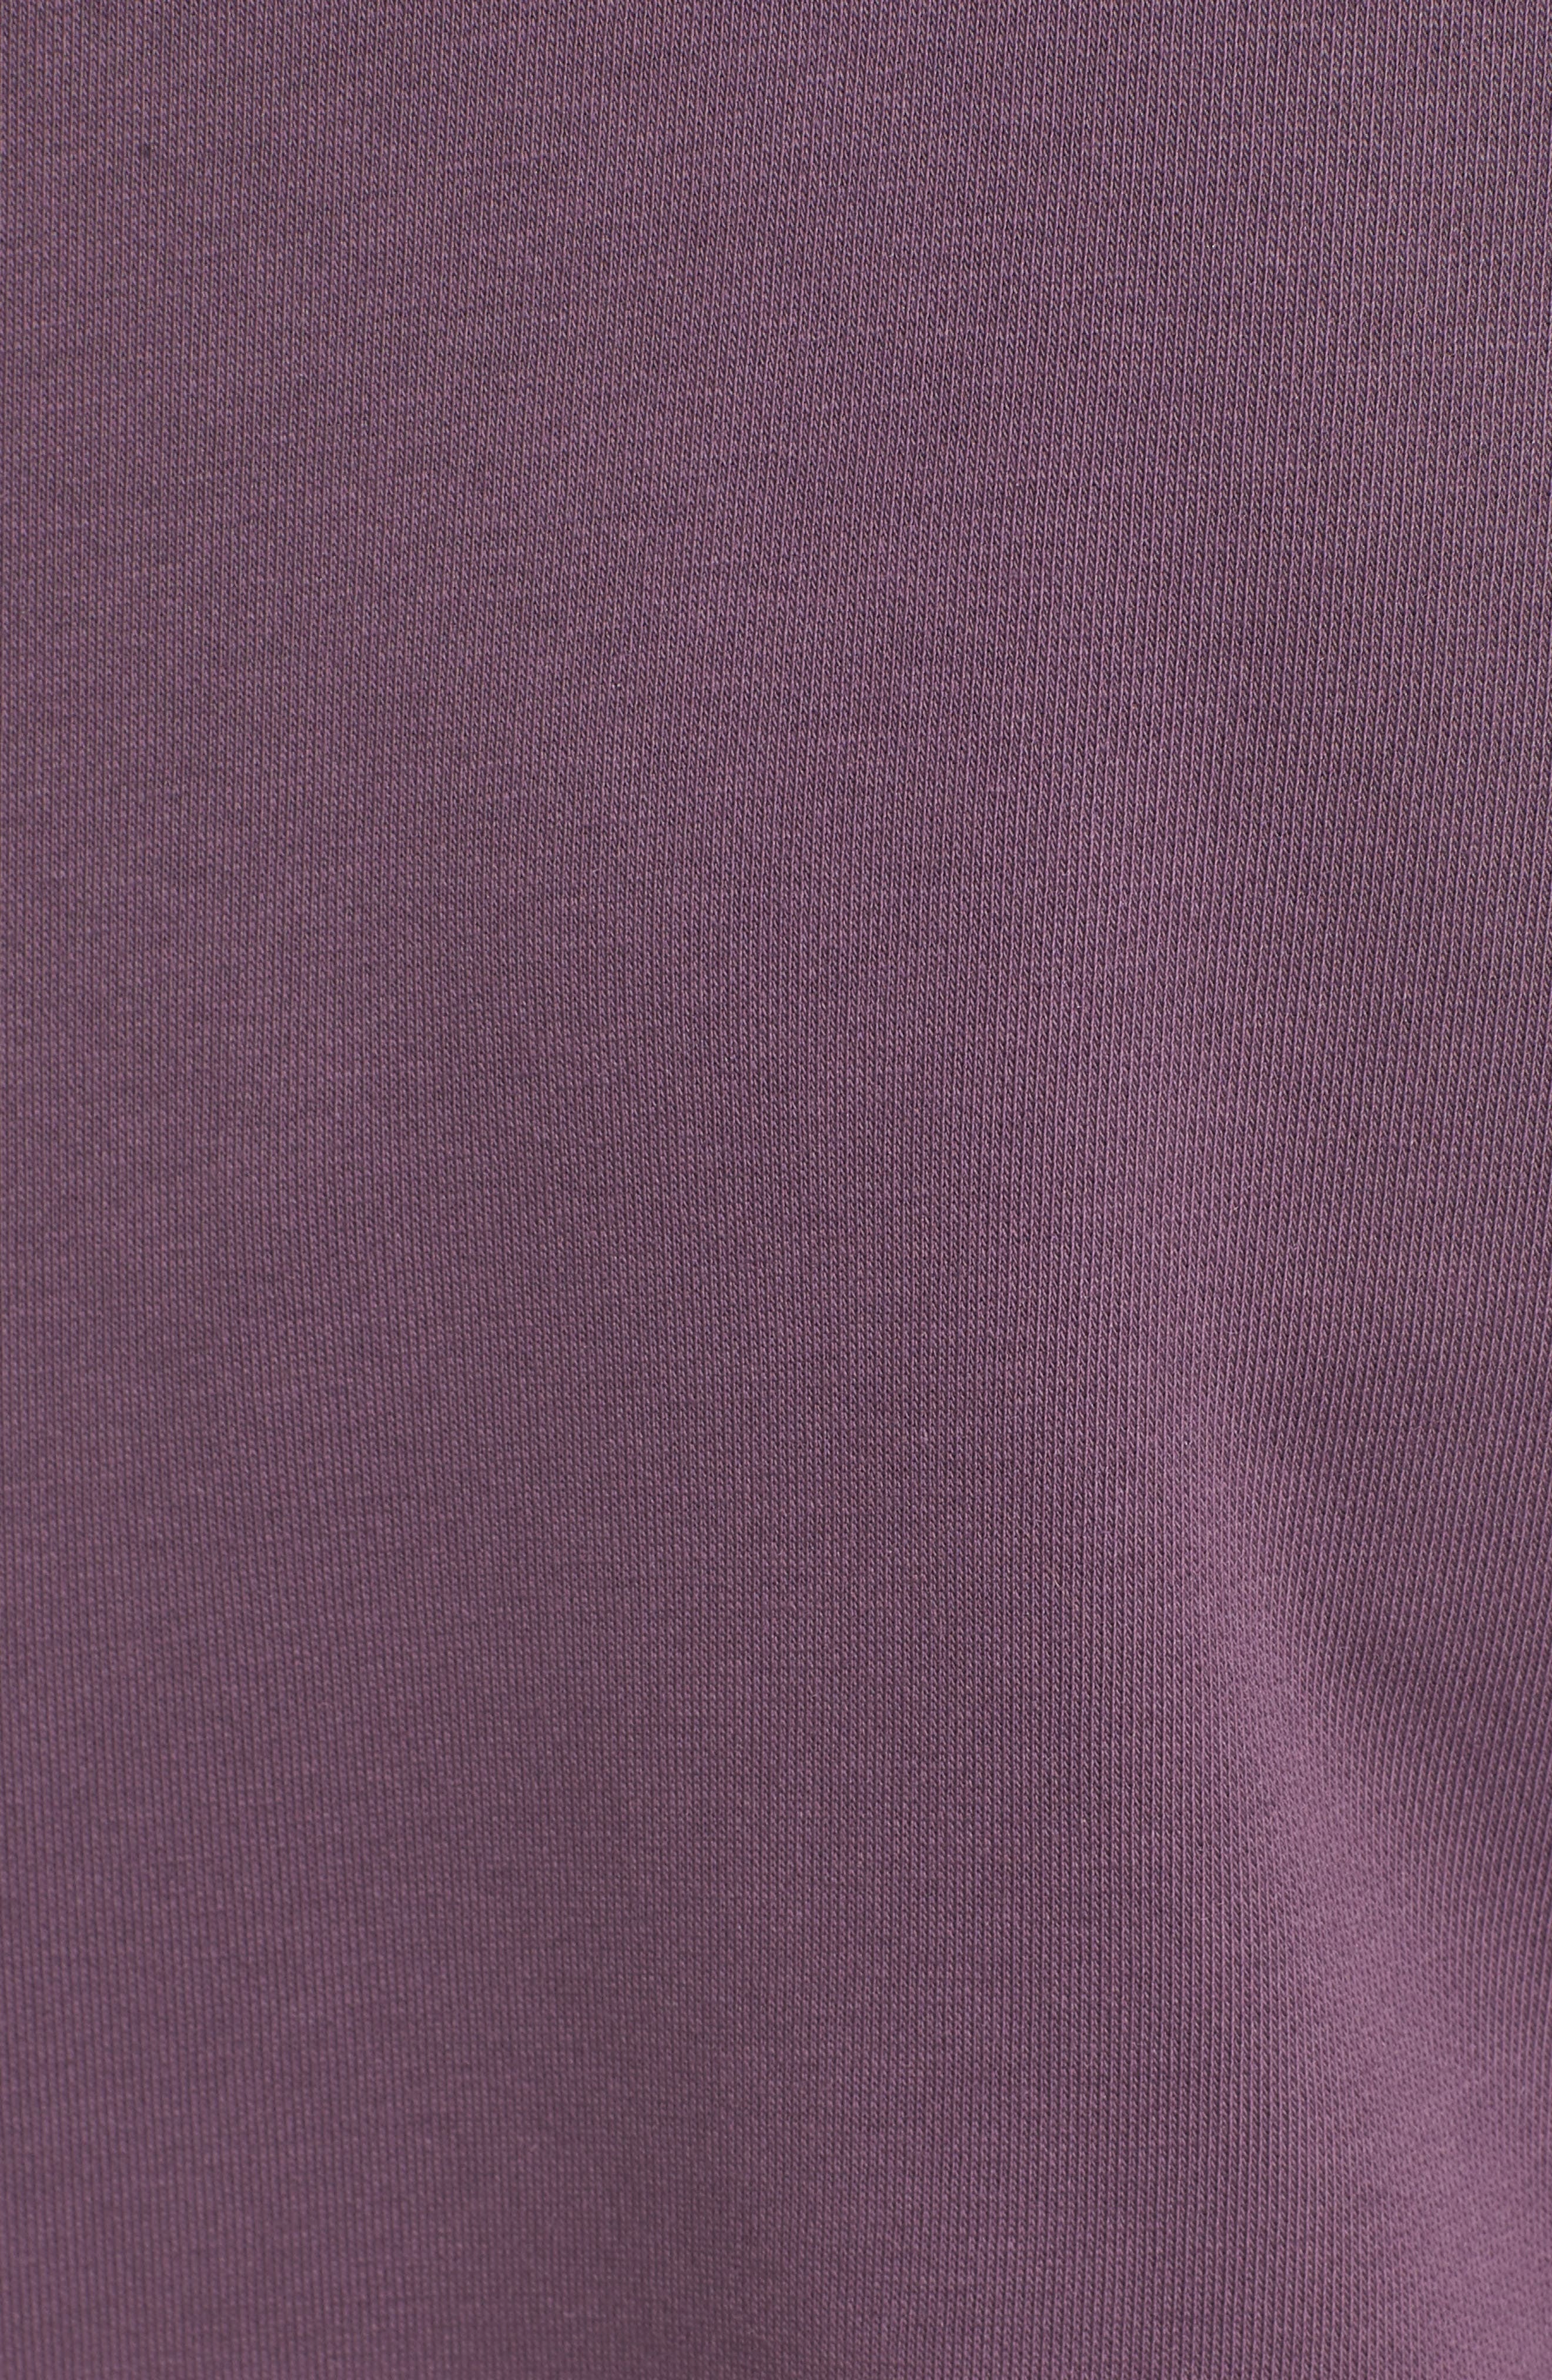 Alternate Image 5  - Chelsea28 Ruffle Sweatshirt